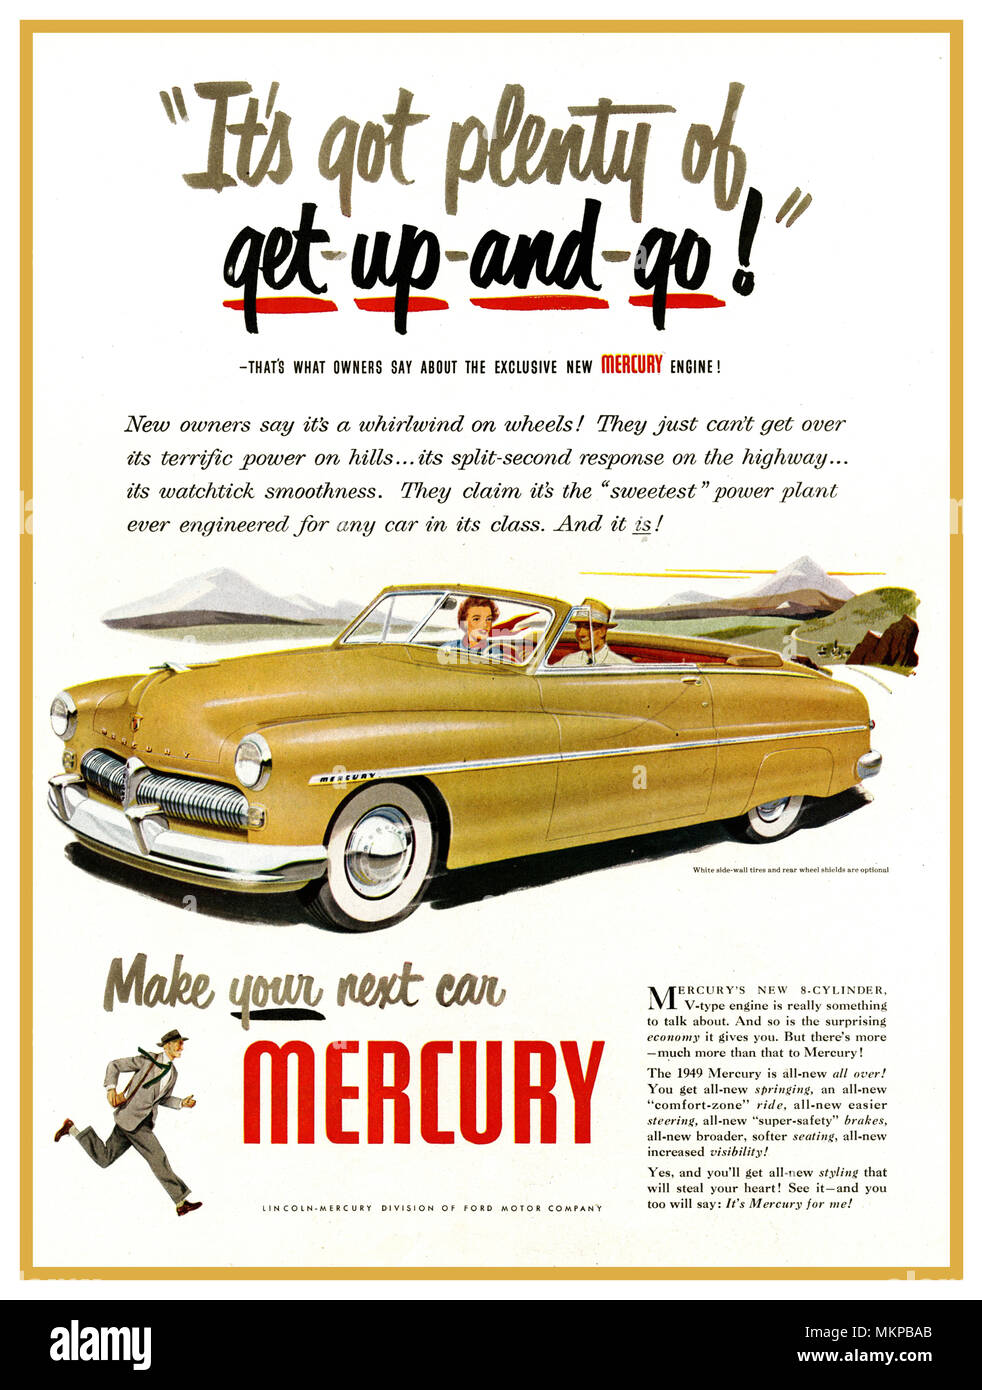 1949  American USA Mercury Car Automobile Press Ad Mercury 2 door, powerful 8 Cylinder V4 engine coupe  'Make Your Next Car a Mercury'' - Stock Image